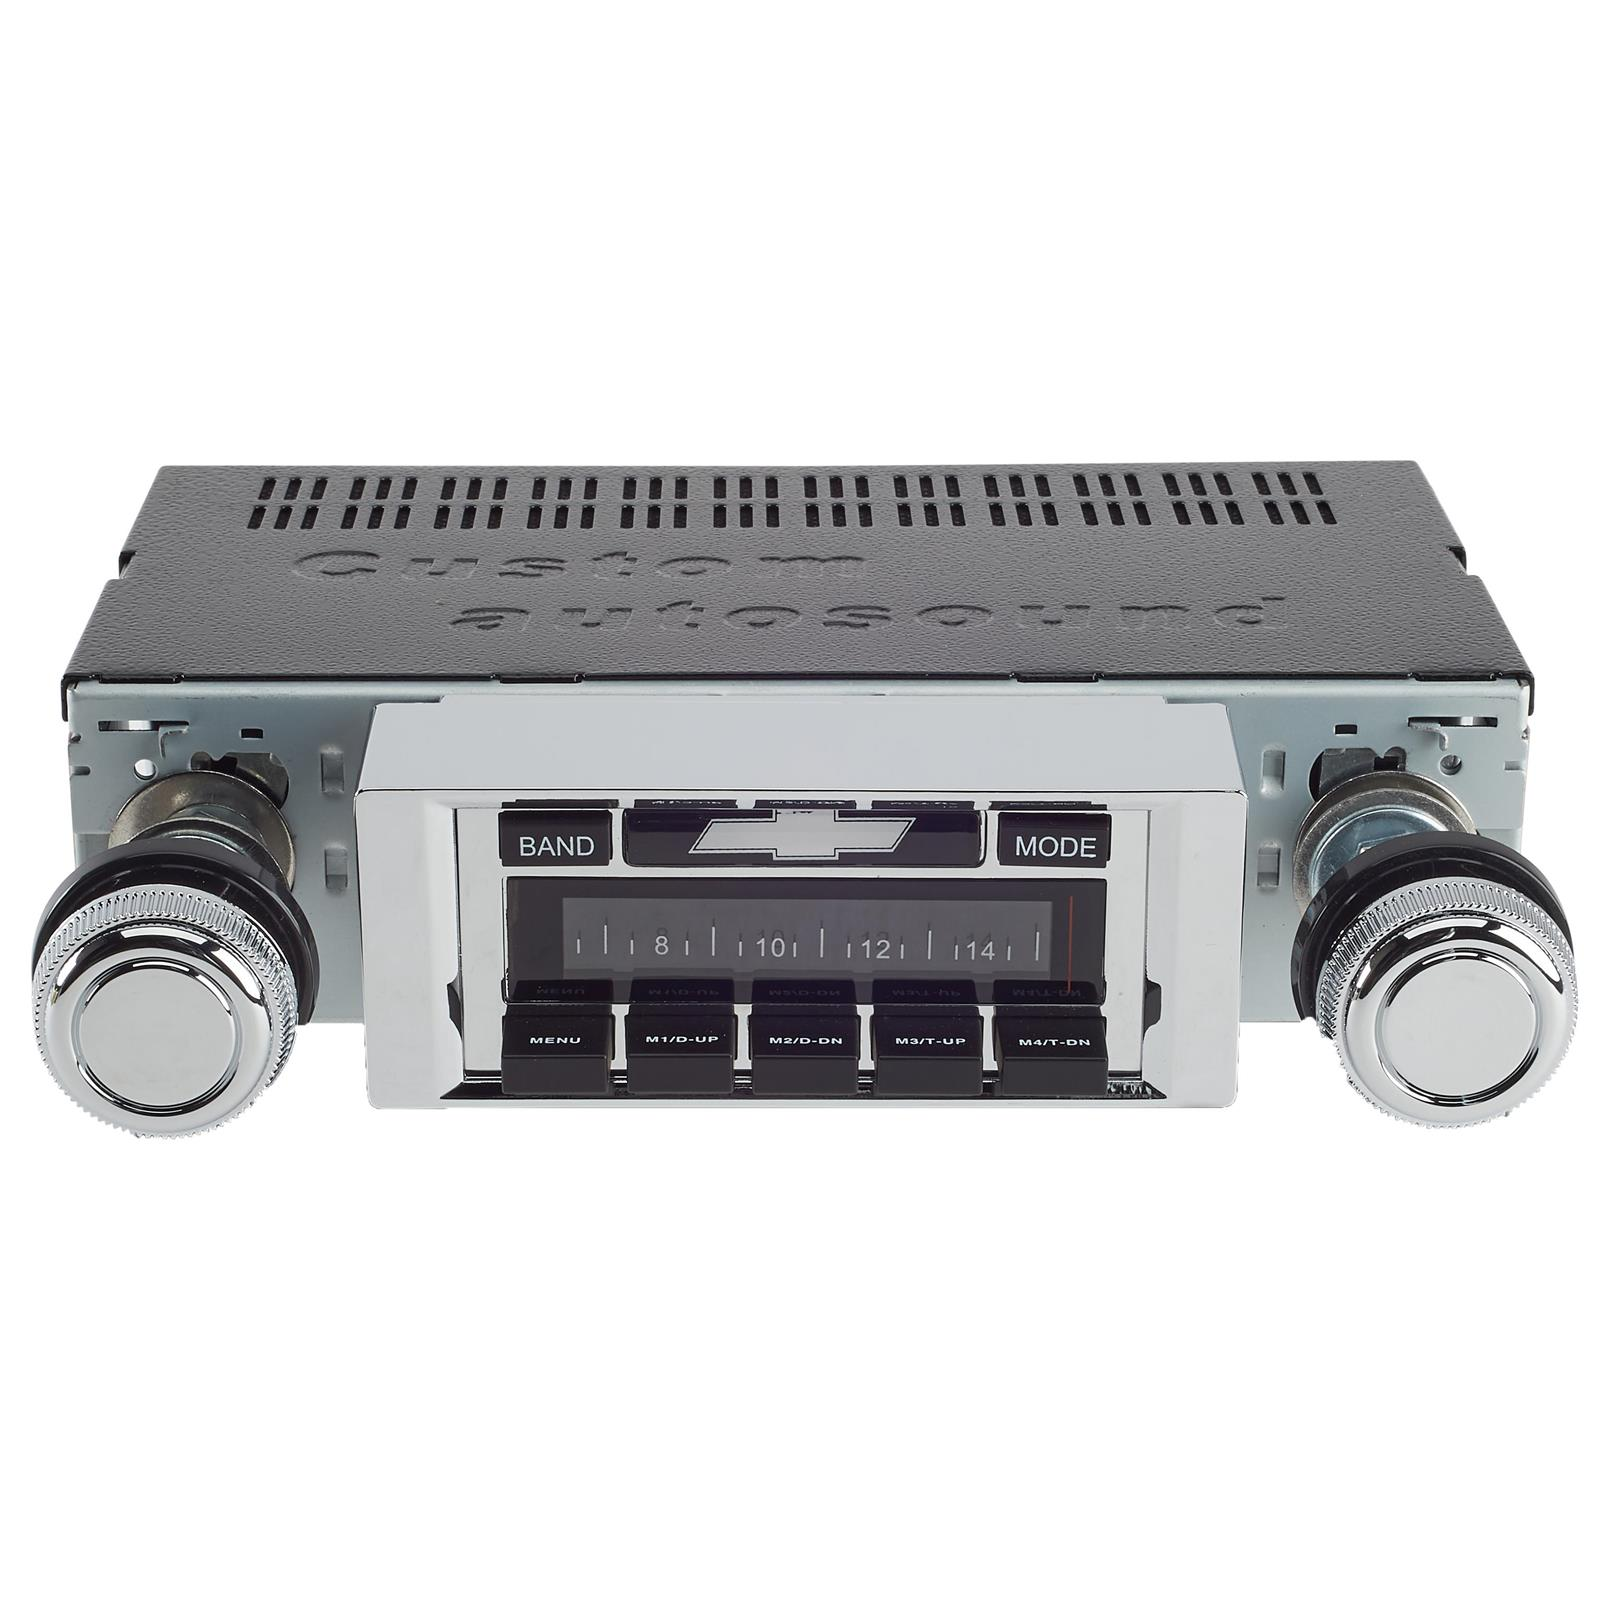 USA-630 II High Power 300 watt AM FM Car Stereo//Radio Custom Autosound Stereo compatible with 1969-1977 Camaro